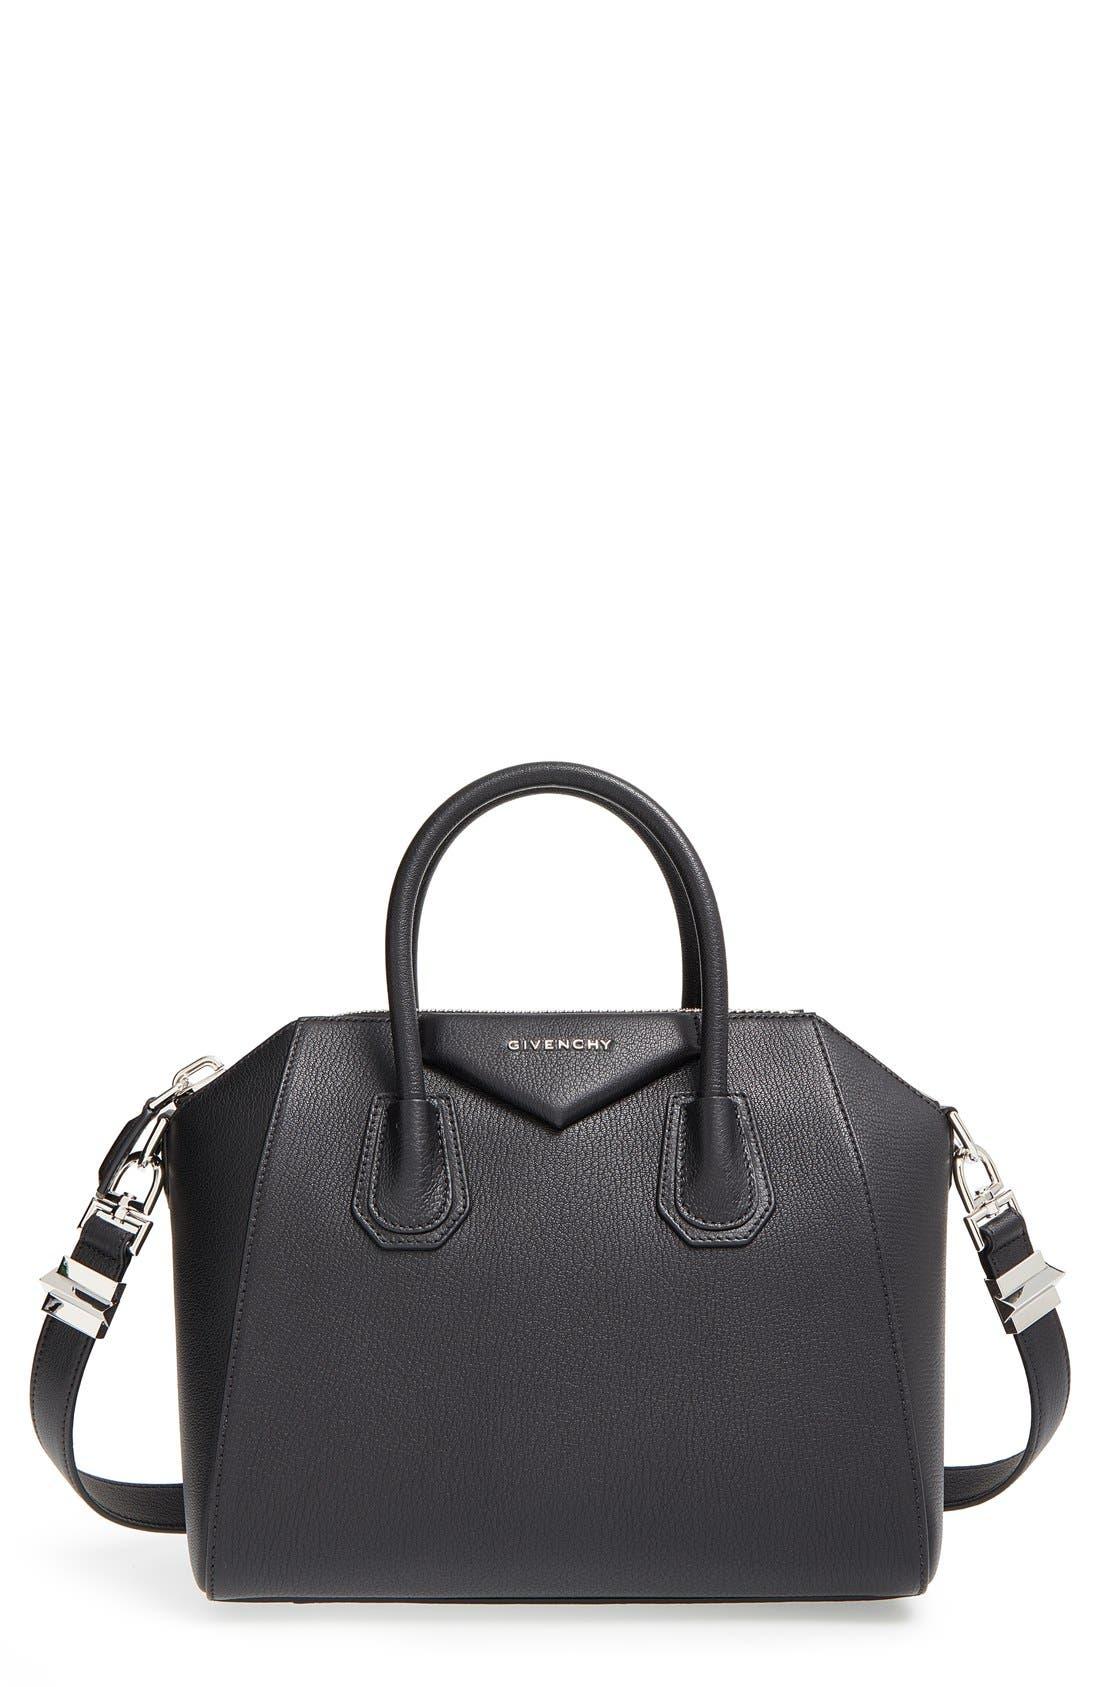 Main Image - Givenchy 'Small Antigona' Sugar Leather Satchel